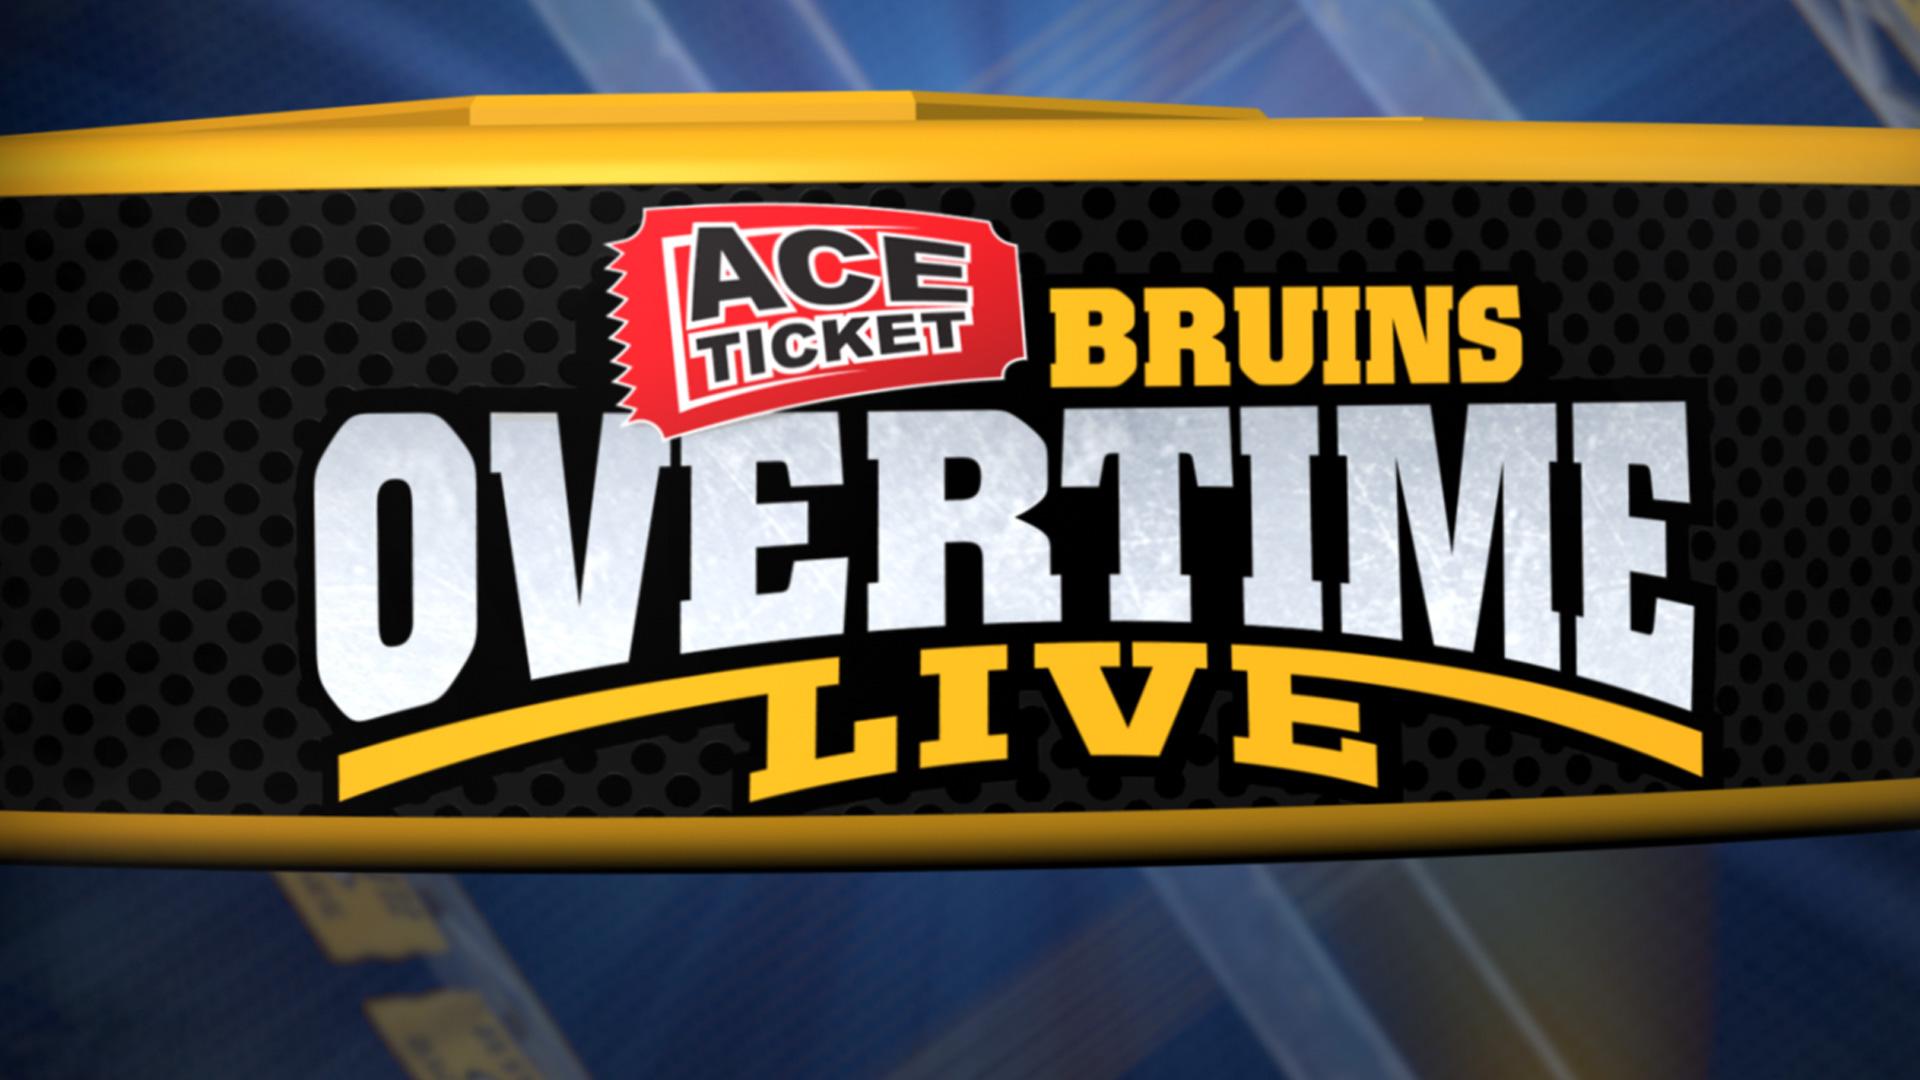 ACE Ticket Bruins Overtime Live